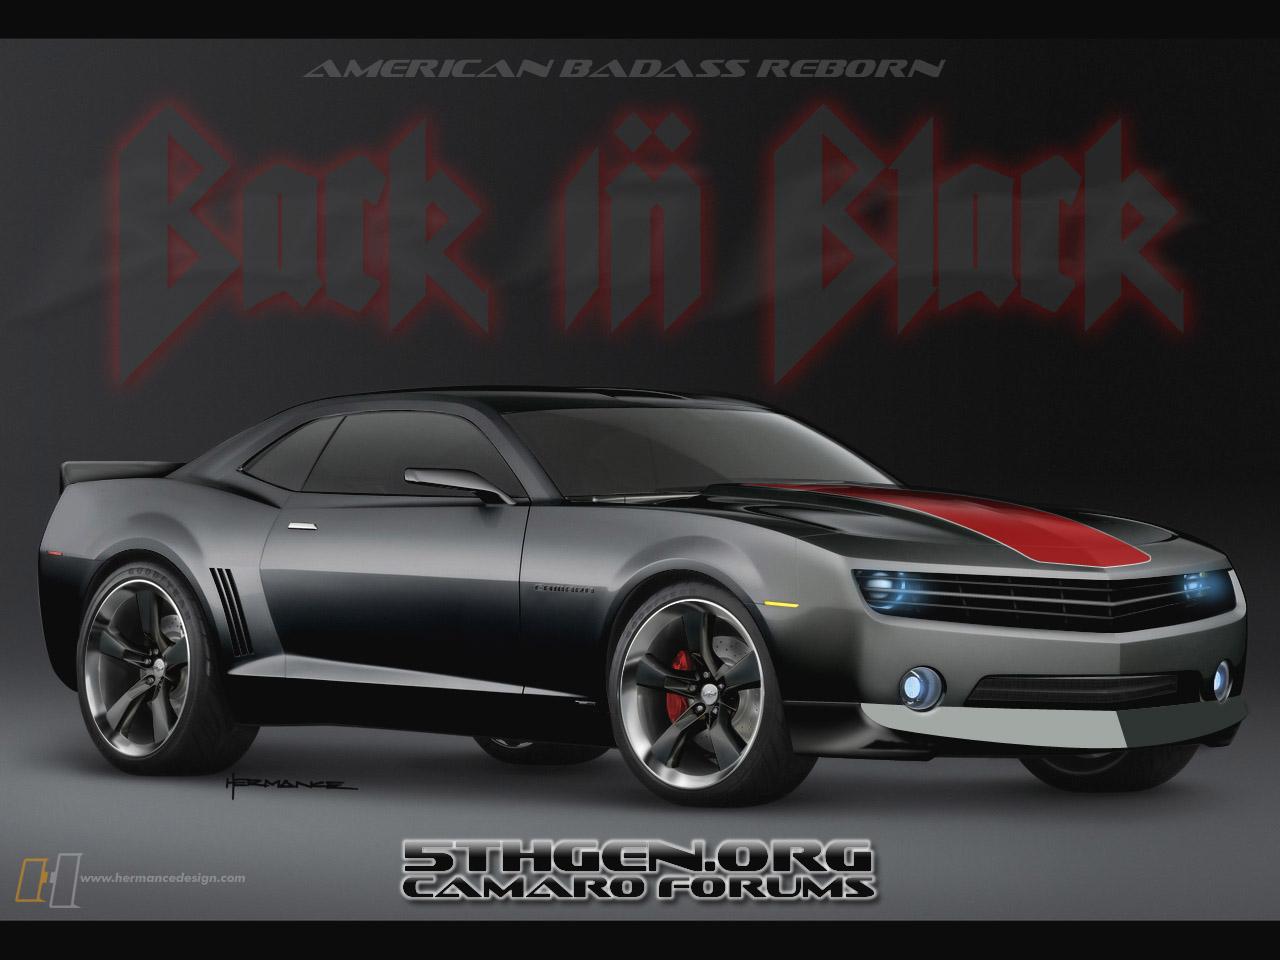 http://2.bp.blogspot.com/-WuMuuGgs-uk/T6jIW6jgY6I/AAAAAAAAAAM/Wj9WfIl5PkU/s1600/Chevrolet_Camaro_Wallpaper_8.jpg